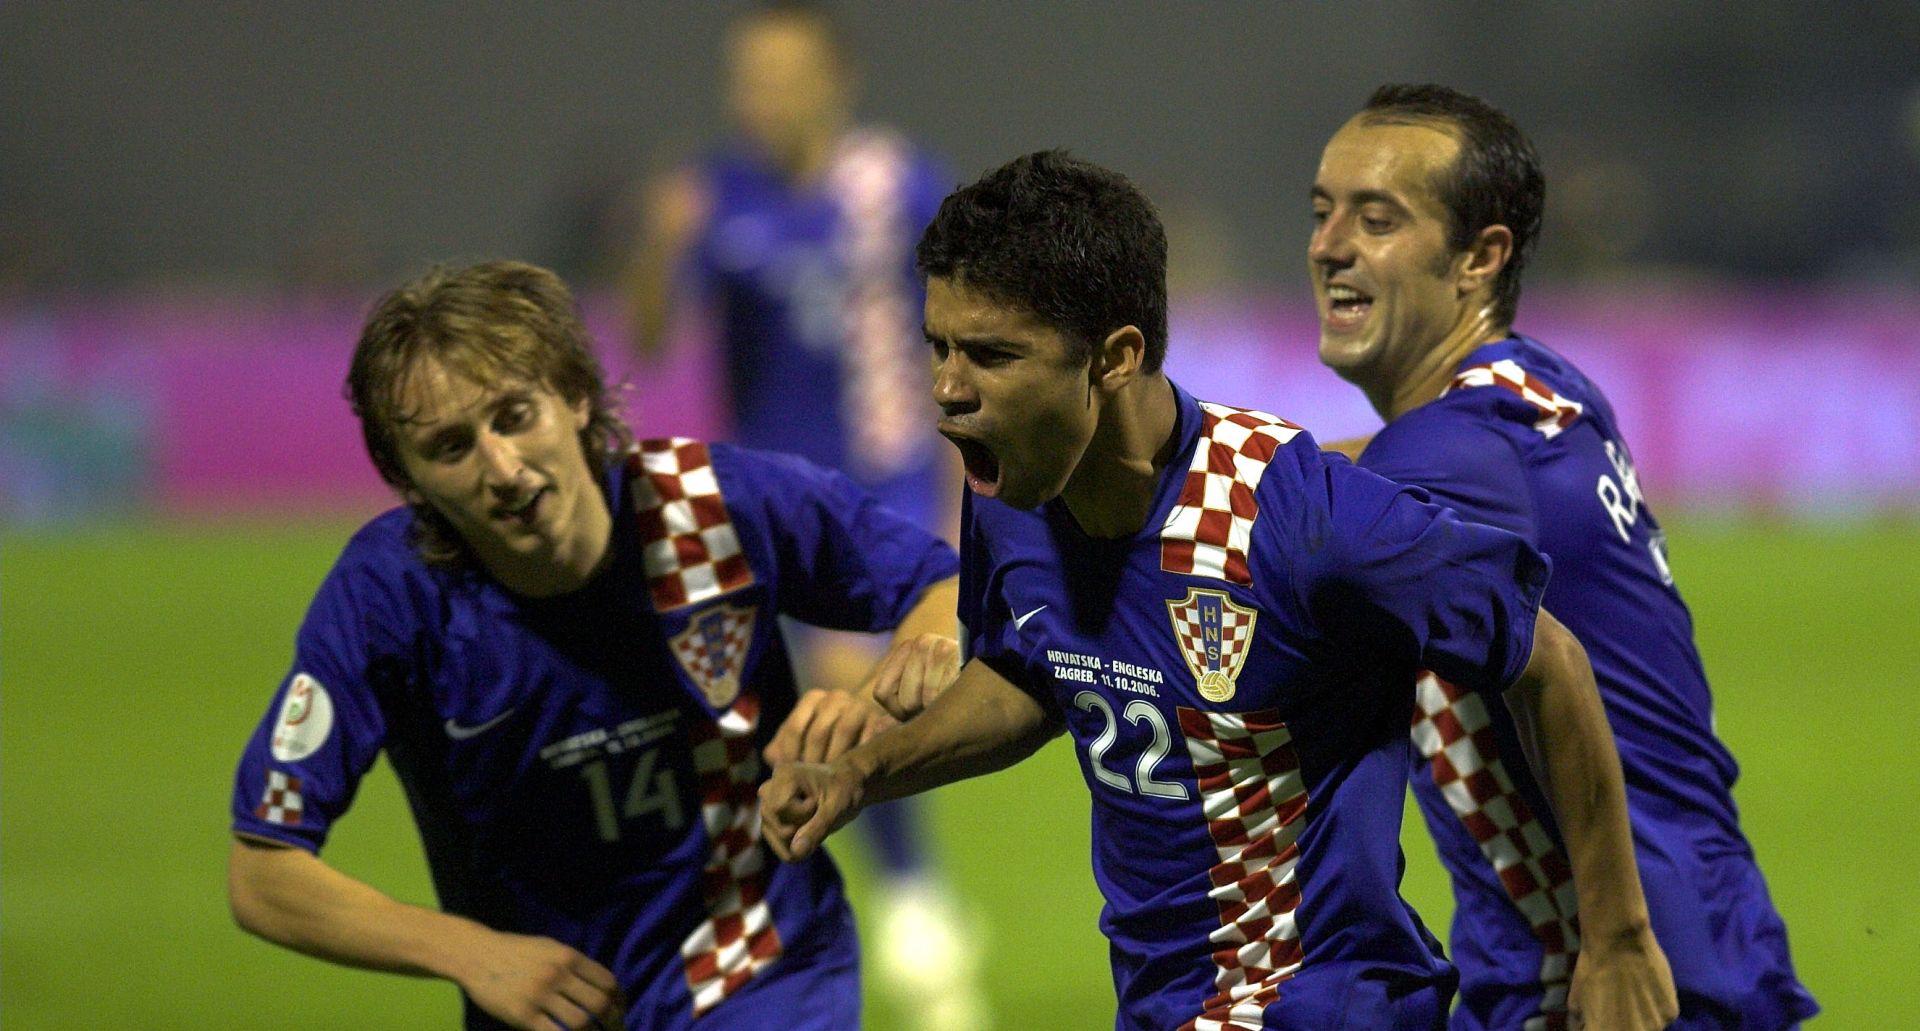 Susrete Hrvatske i Engleske obilježili 'Wally with the Brolly' i krtičnjak